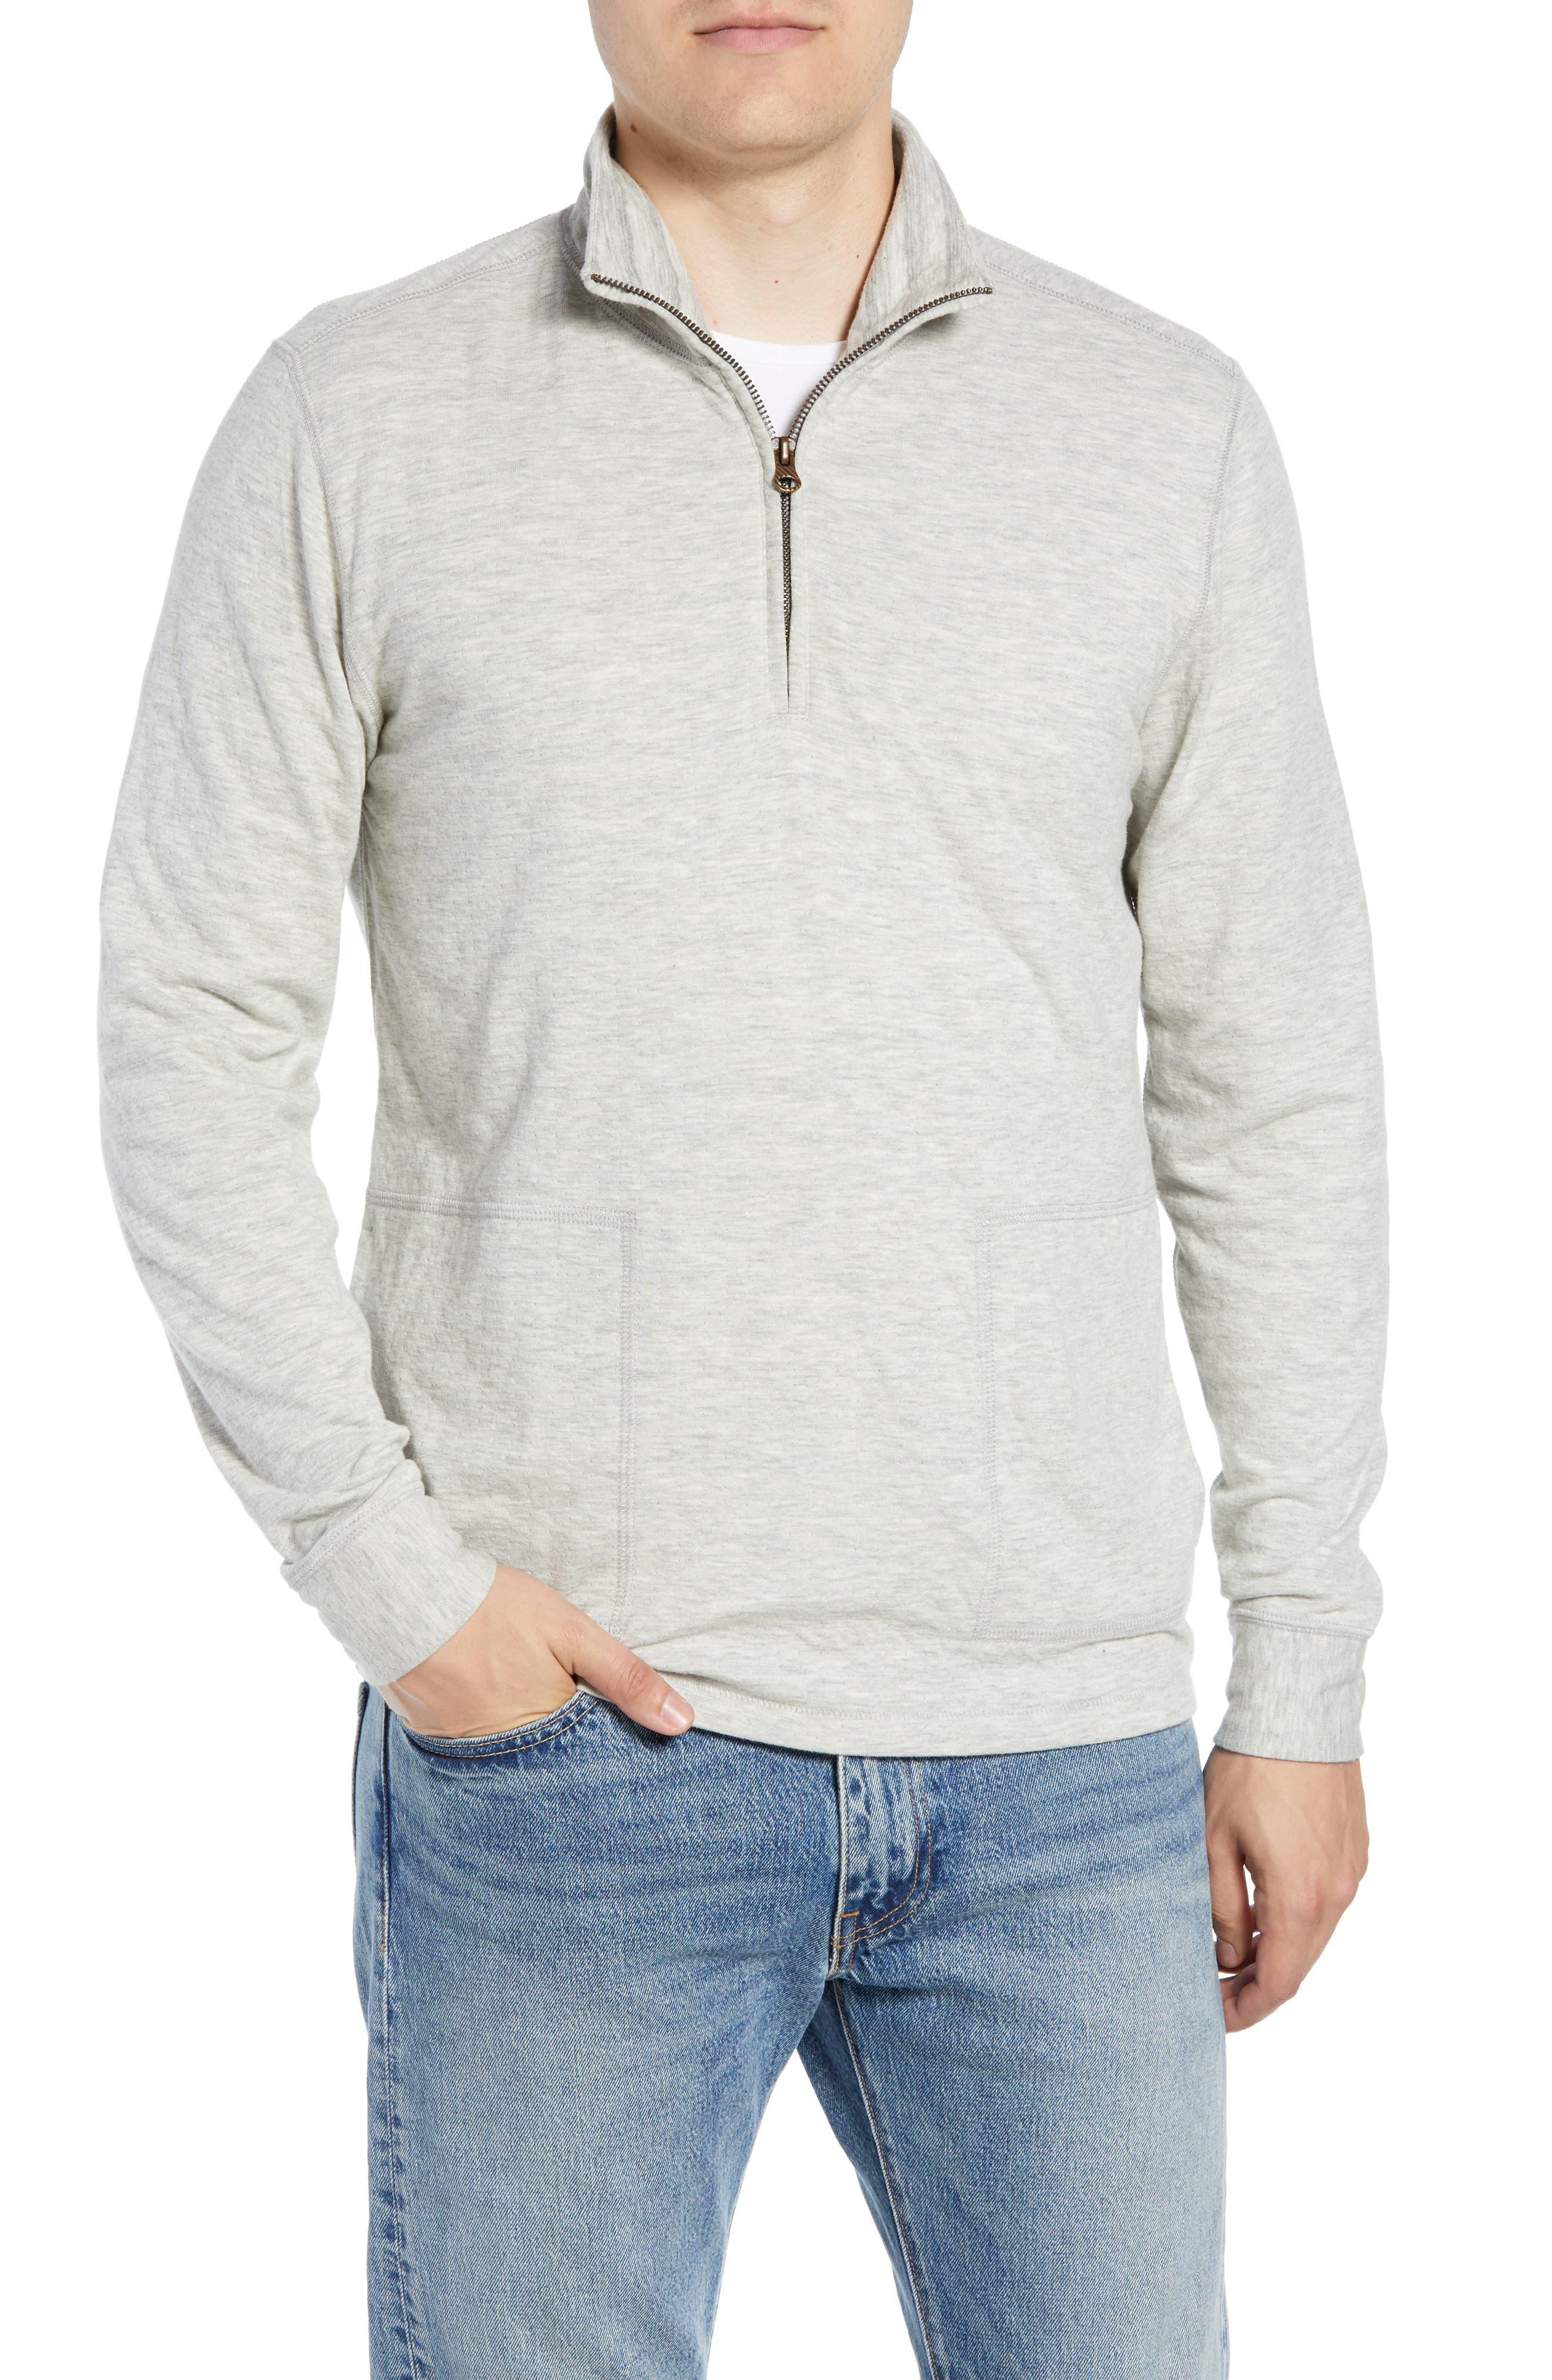 Billy Reid Charles Regular Fit Half Zip Sweater, Grey